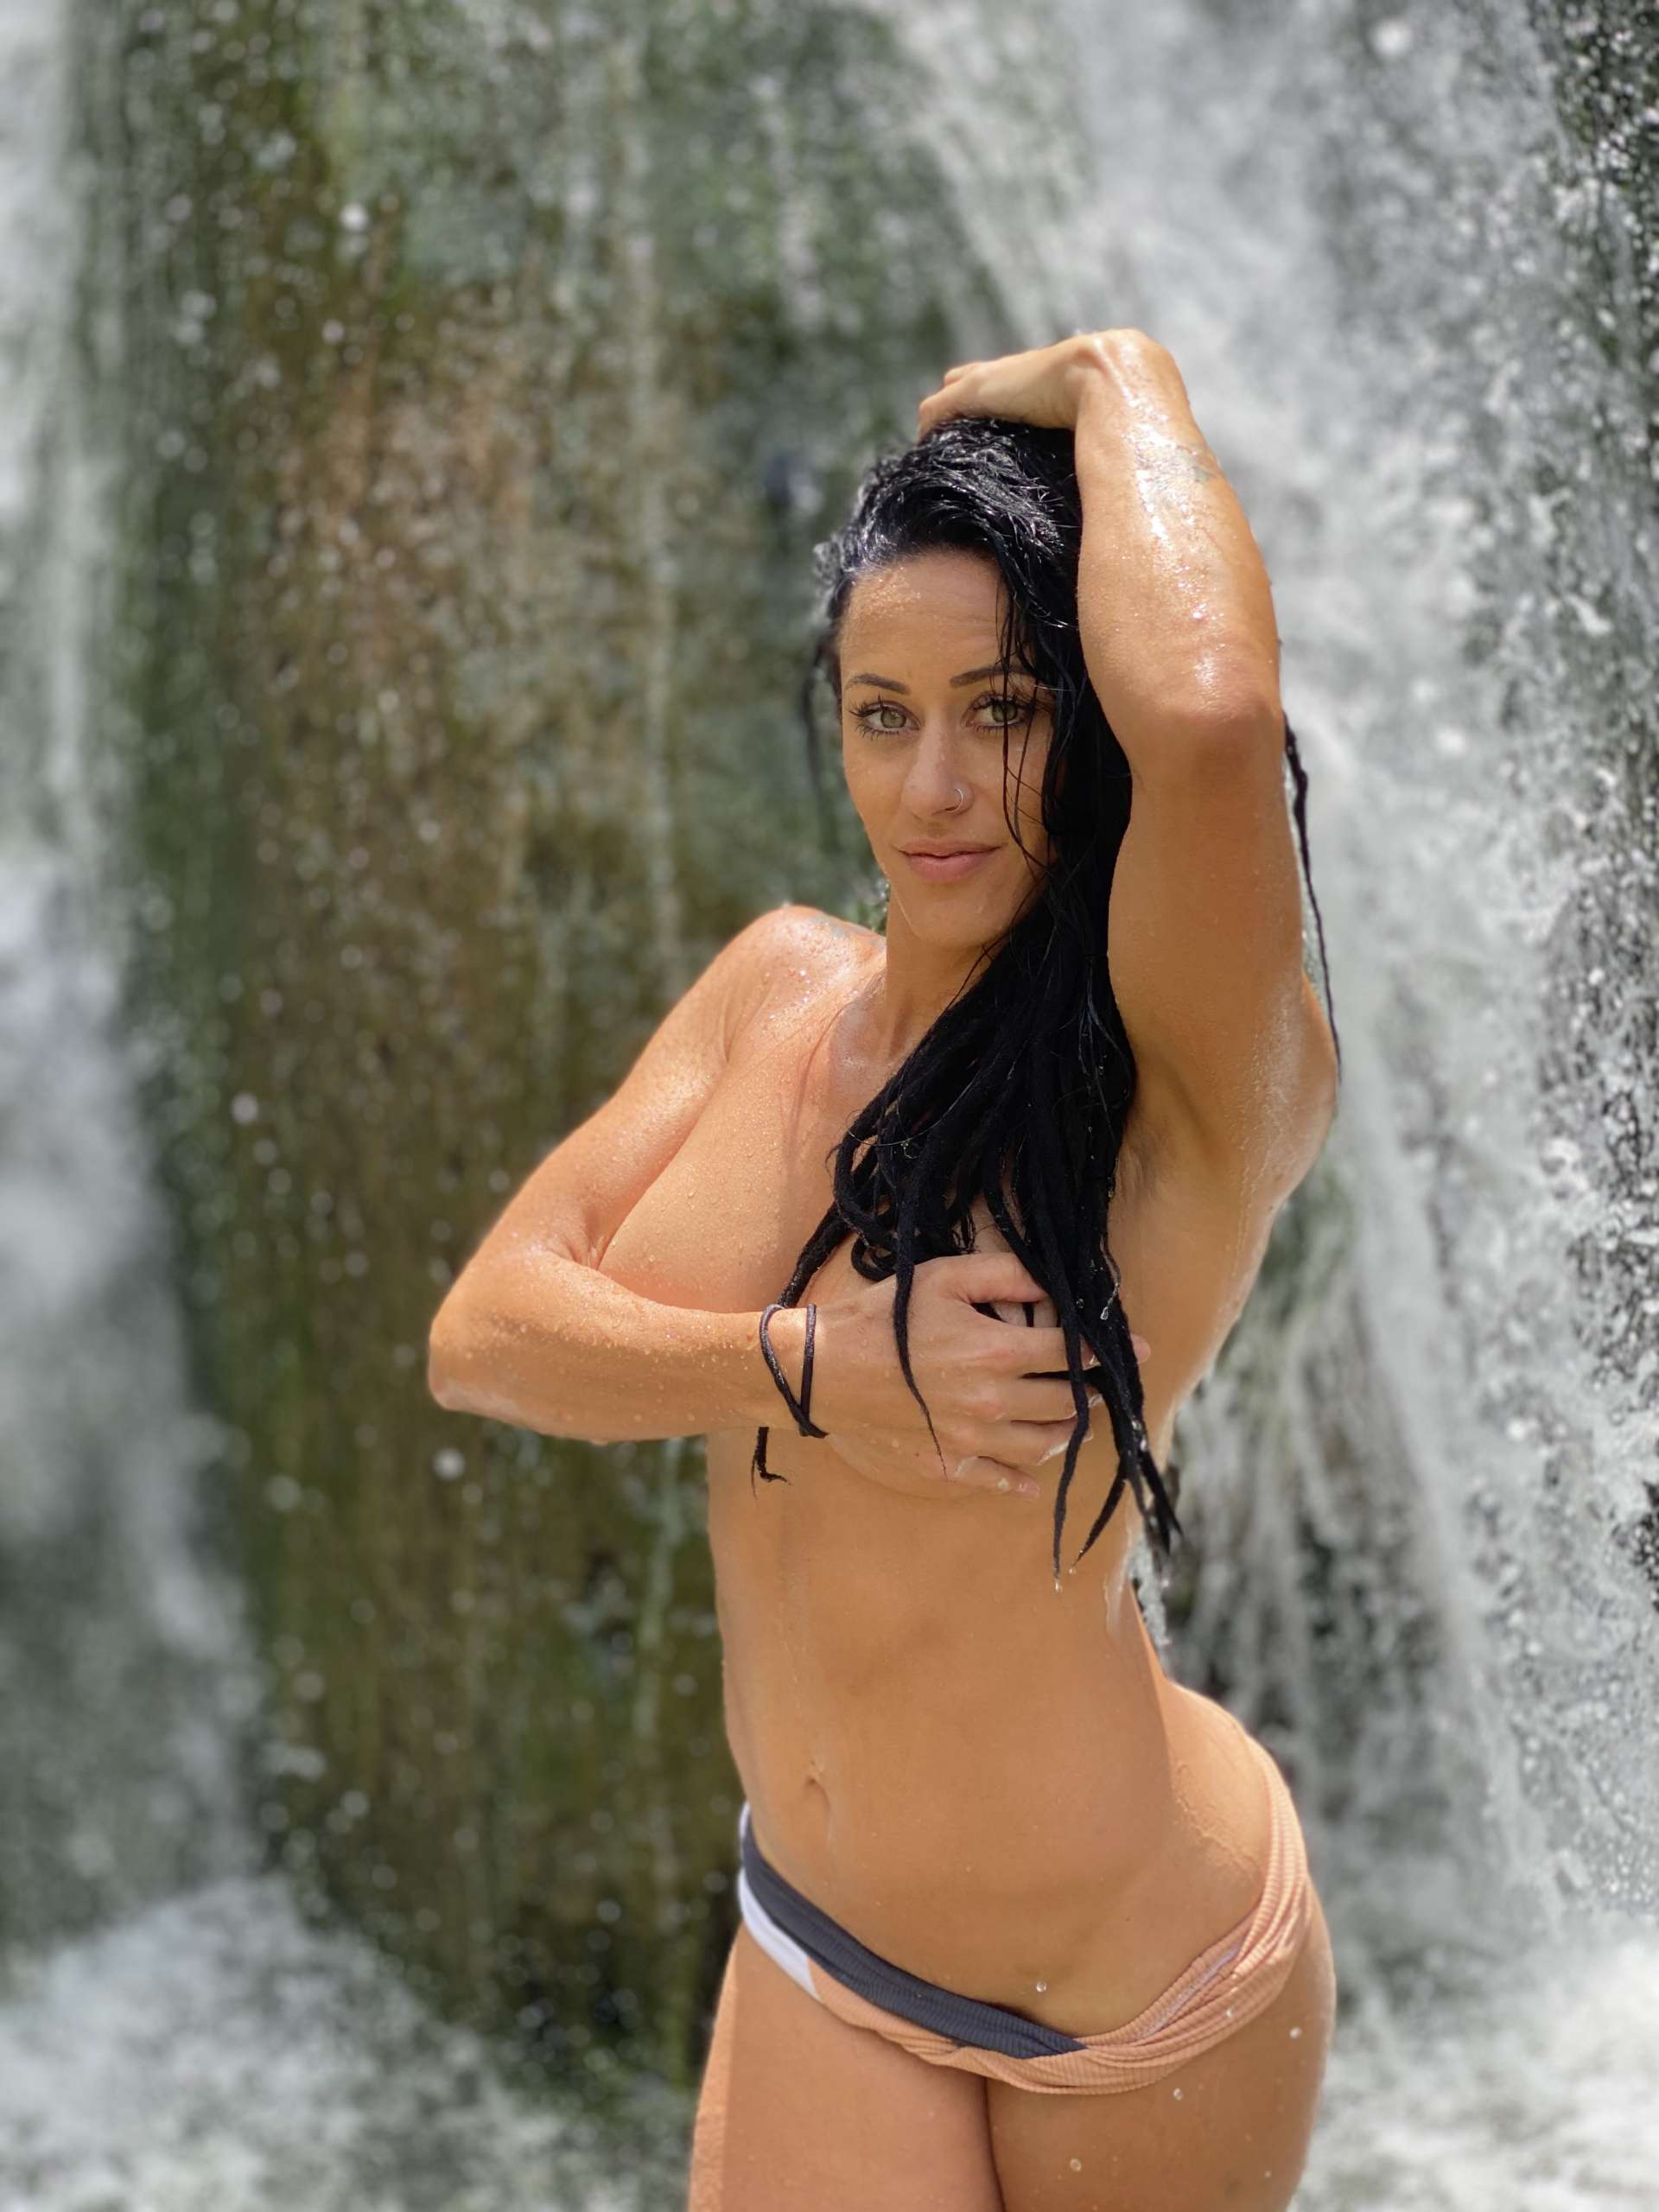 Aubrey Maverick naked by waterfall